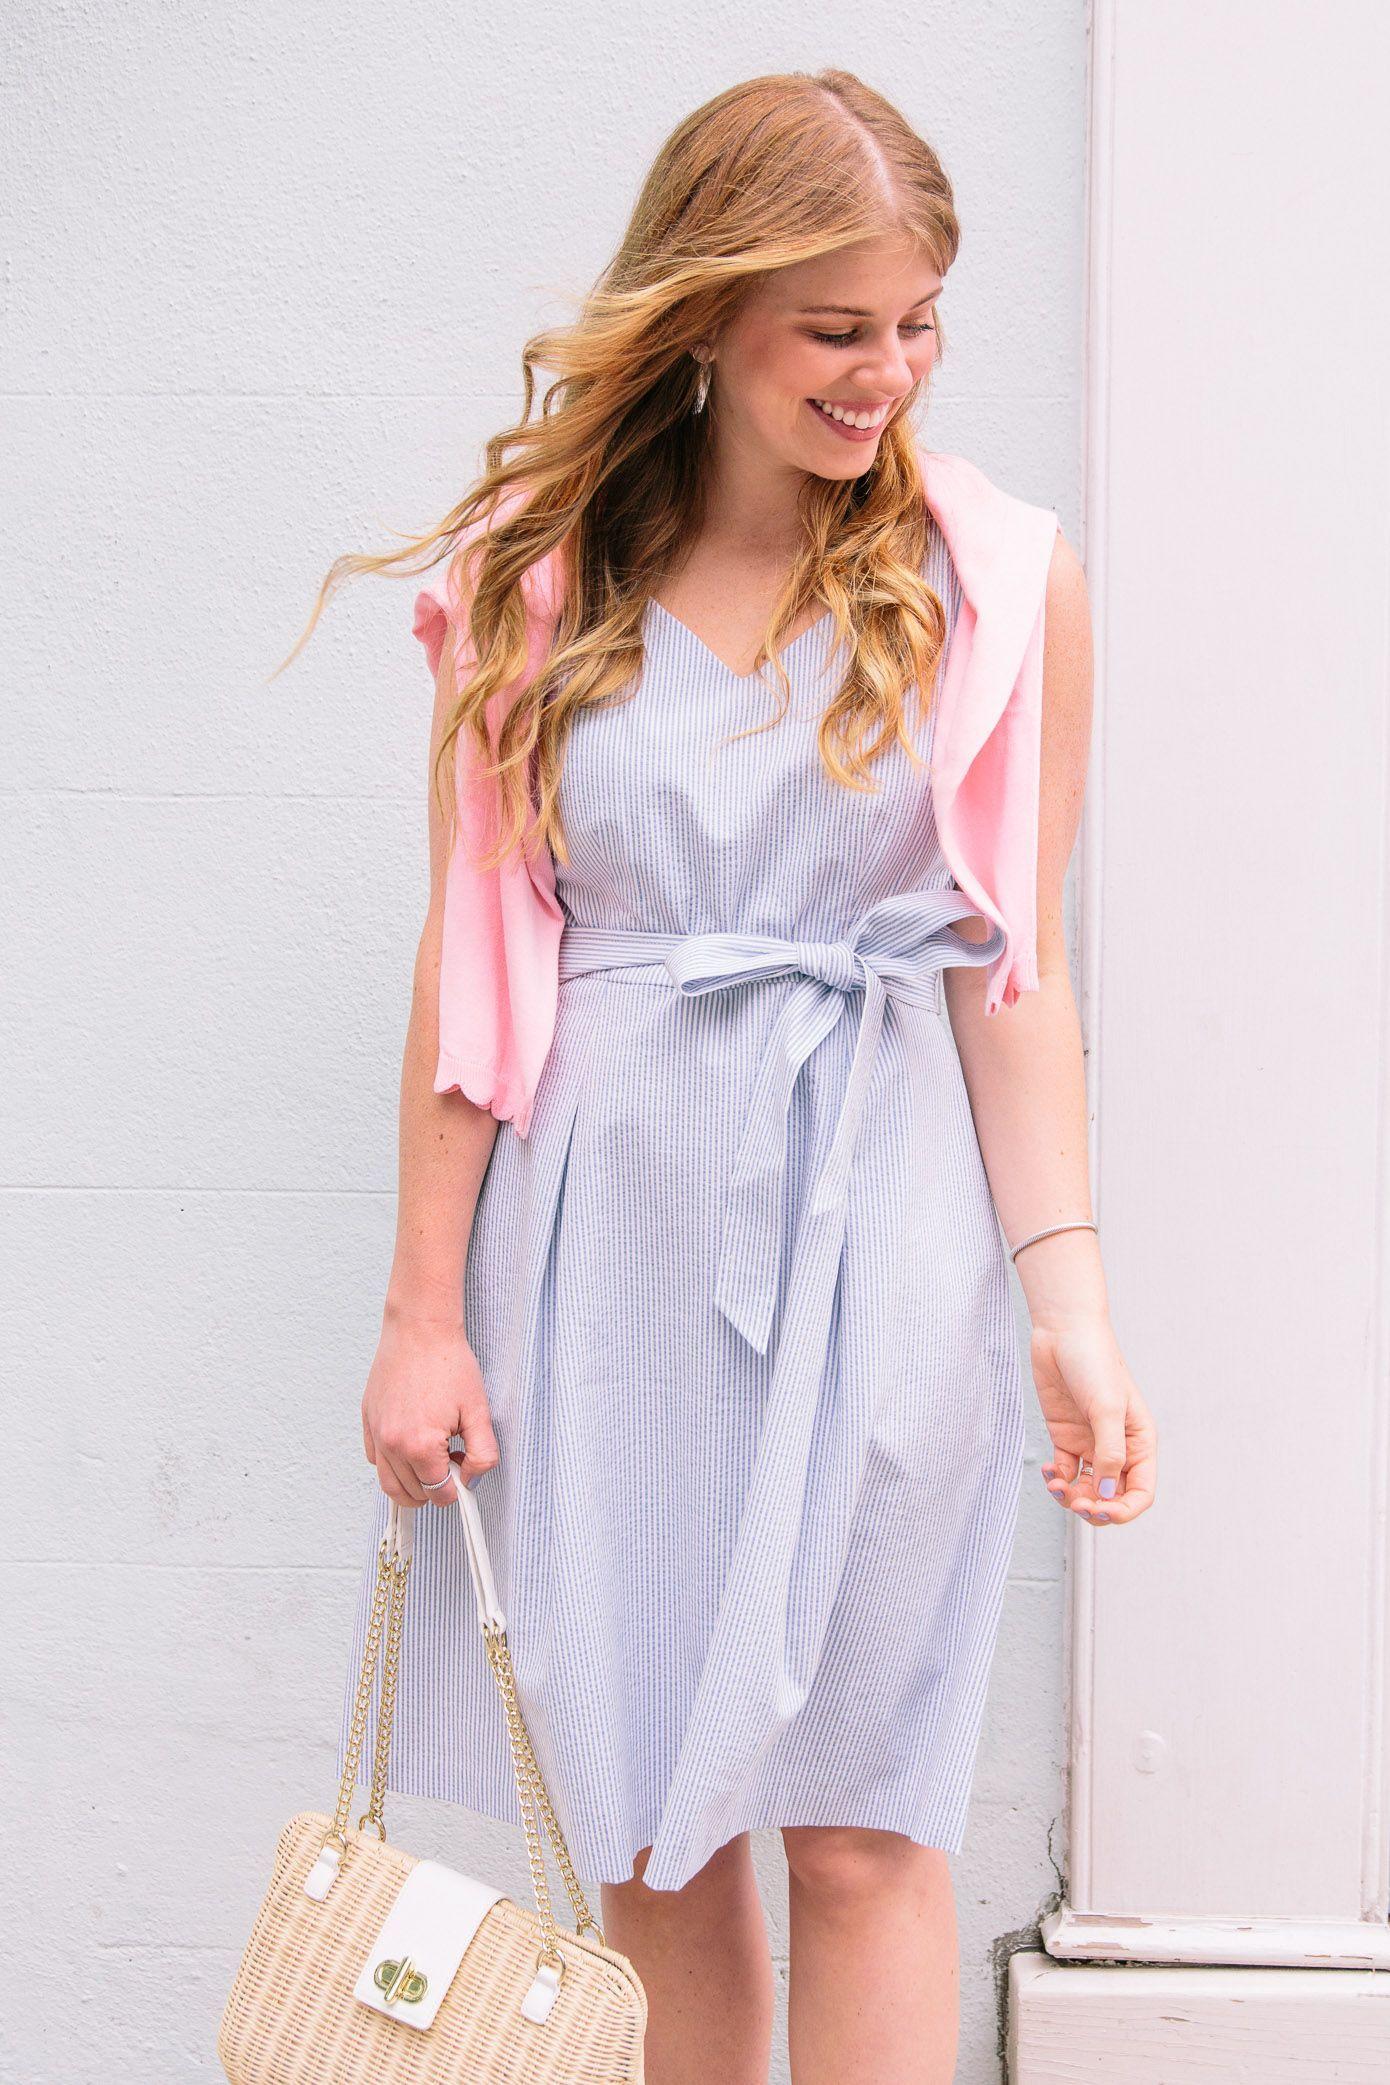 5de8eef5775 We love how simple   chic Louella Reese looks in the Talbots Belted  Seersucker Fit   Flare Dress.